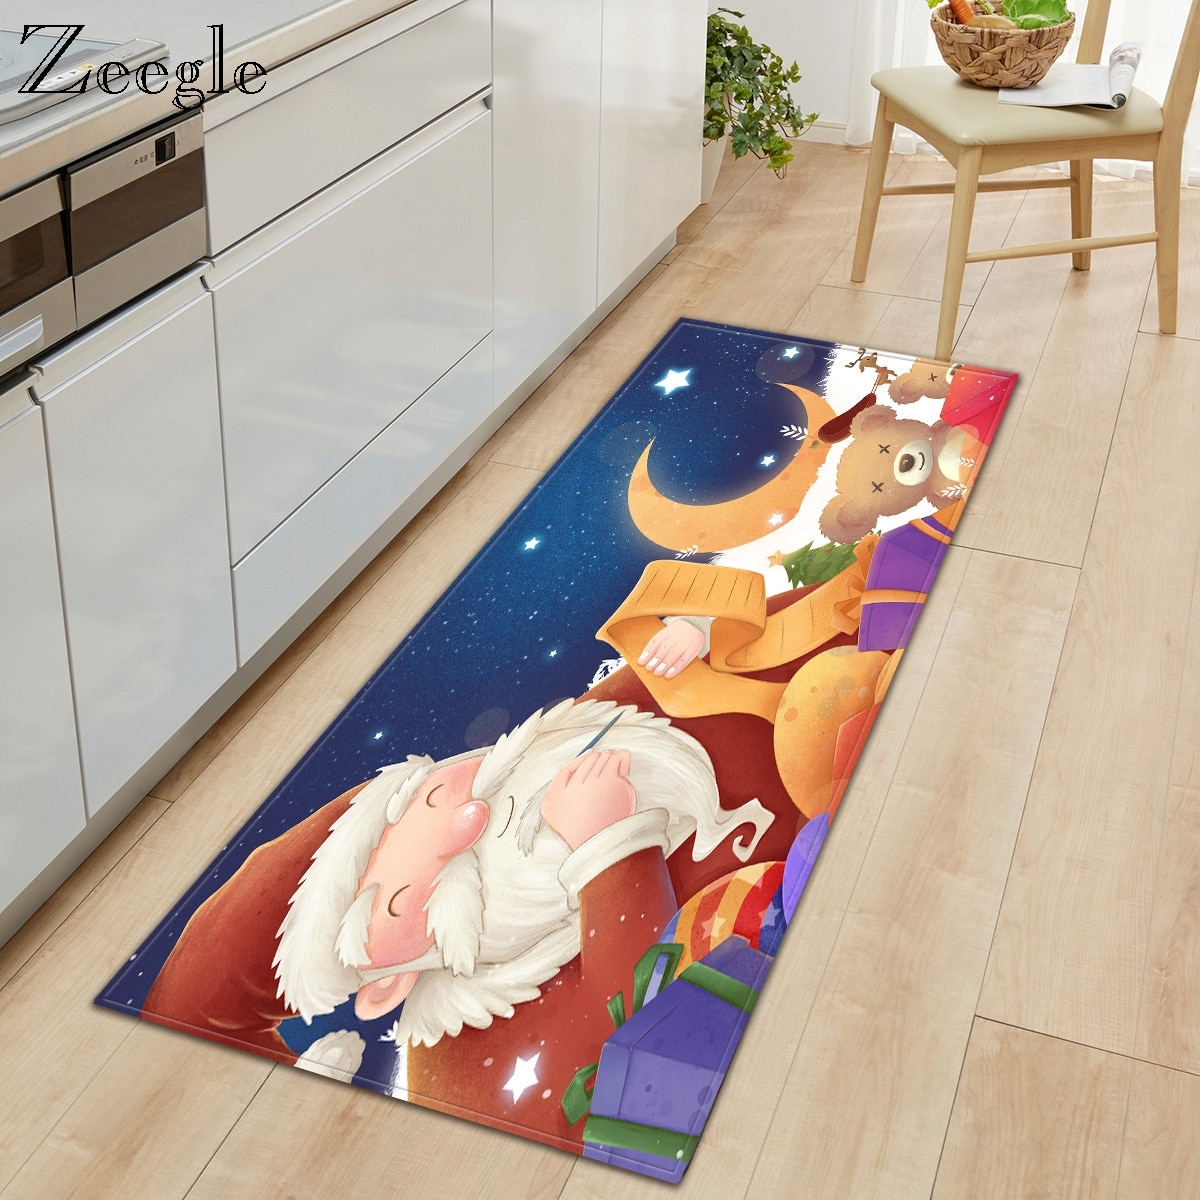 Zeegle-سجادة مطبخ طويلة مقاومة للأوساخ ، ممسحة أرضية لممر الكريسماس ، غير قابلة للانزلاق مع امتصاص الماء ، سجادة حمام بجانب السرير